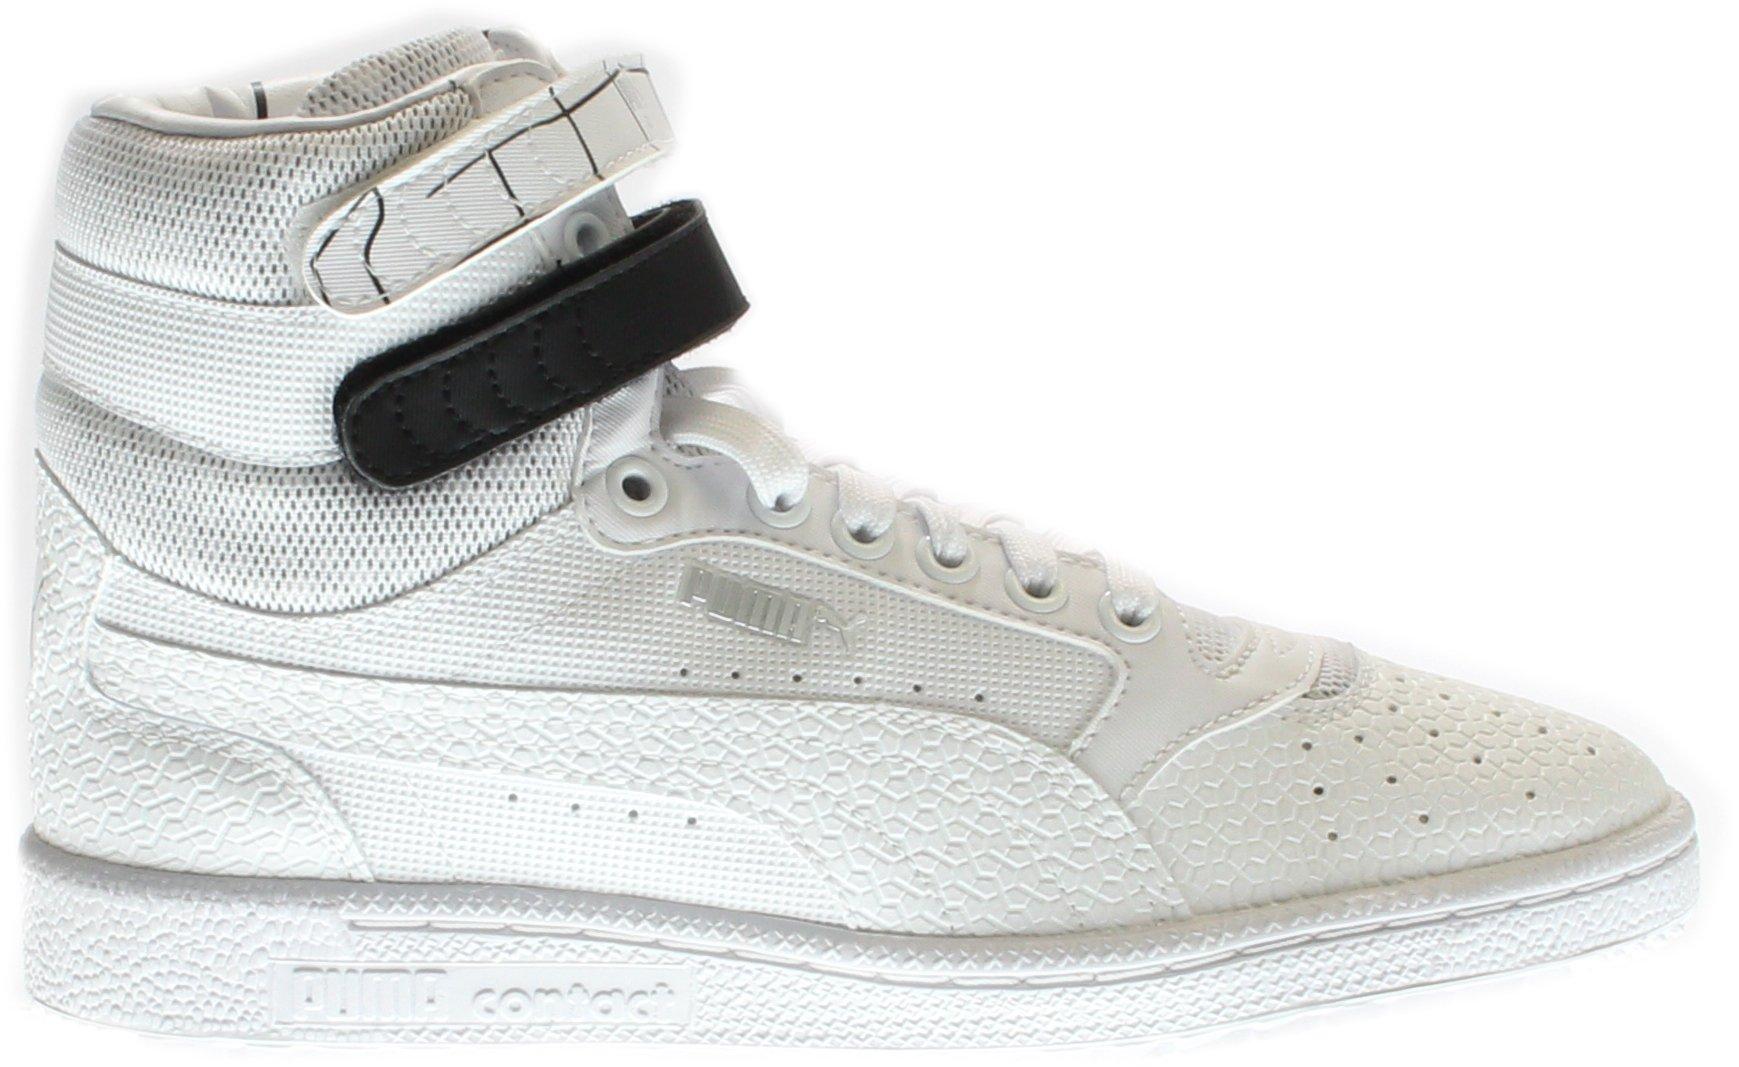 PUMA Women's Sky Ii Hi Sf Texture WN's Basketball Shoe, White Black, 8.5 M US by PUMA (Image #2)